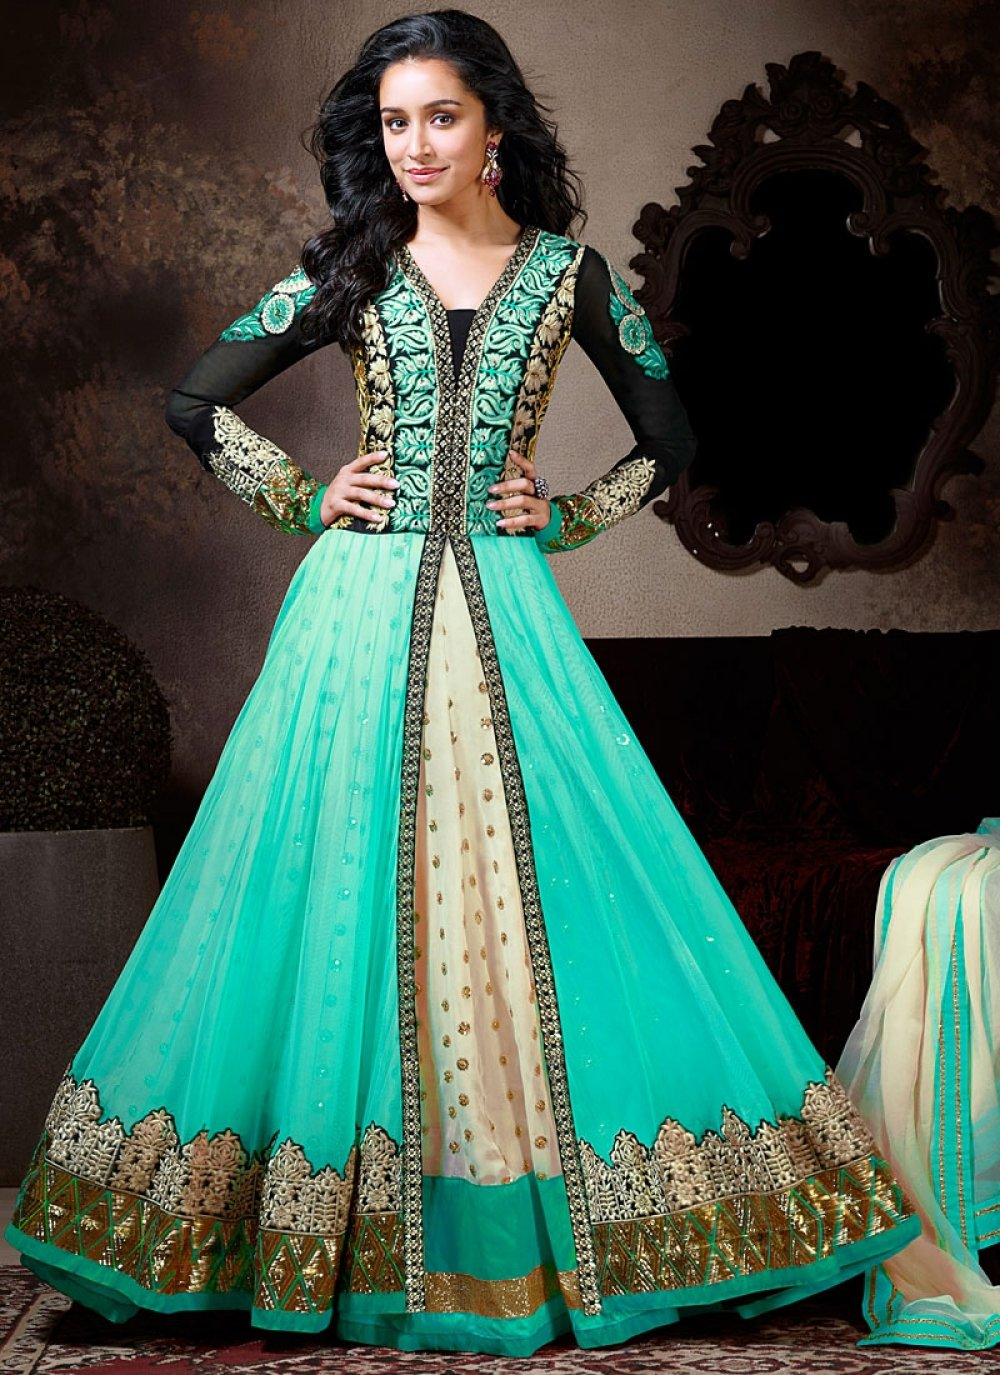 Shraddha Kapoor Turquoise Anarkali Suit